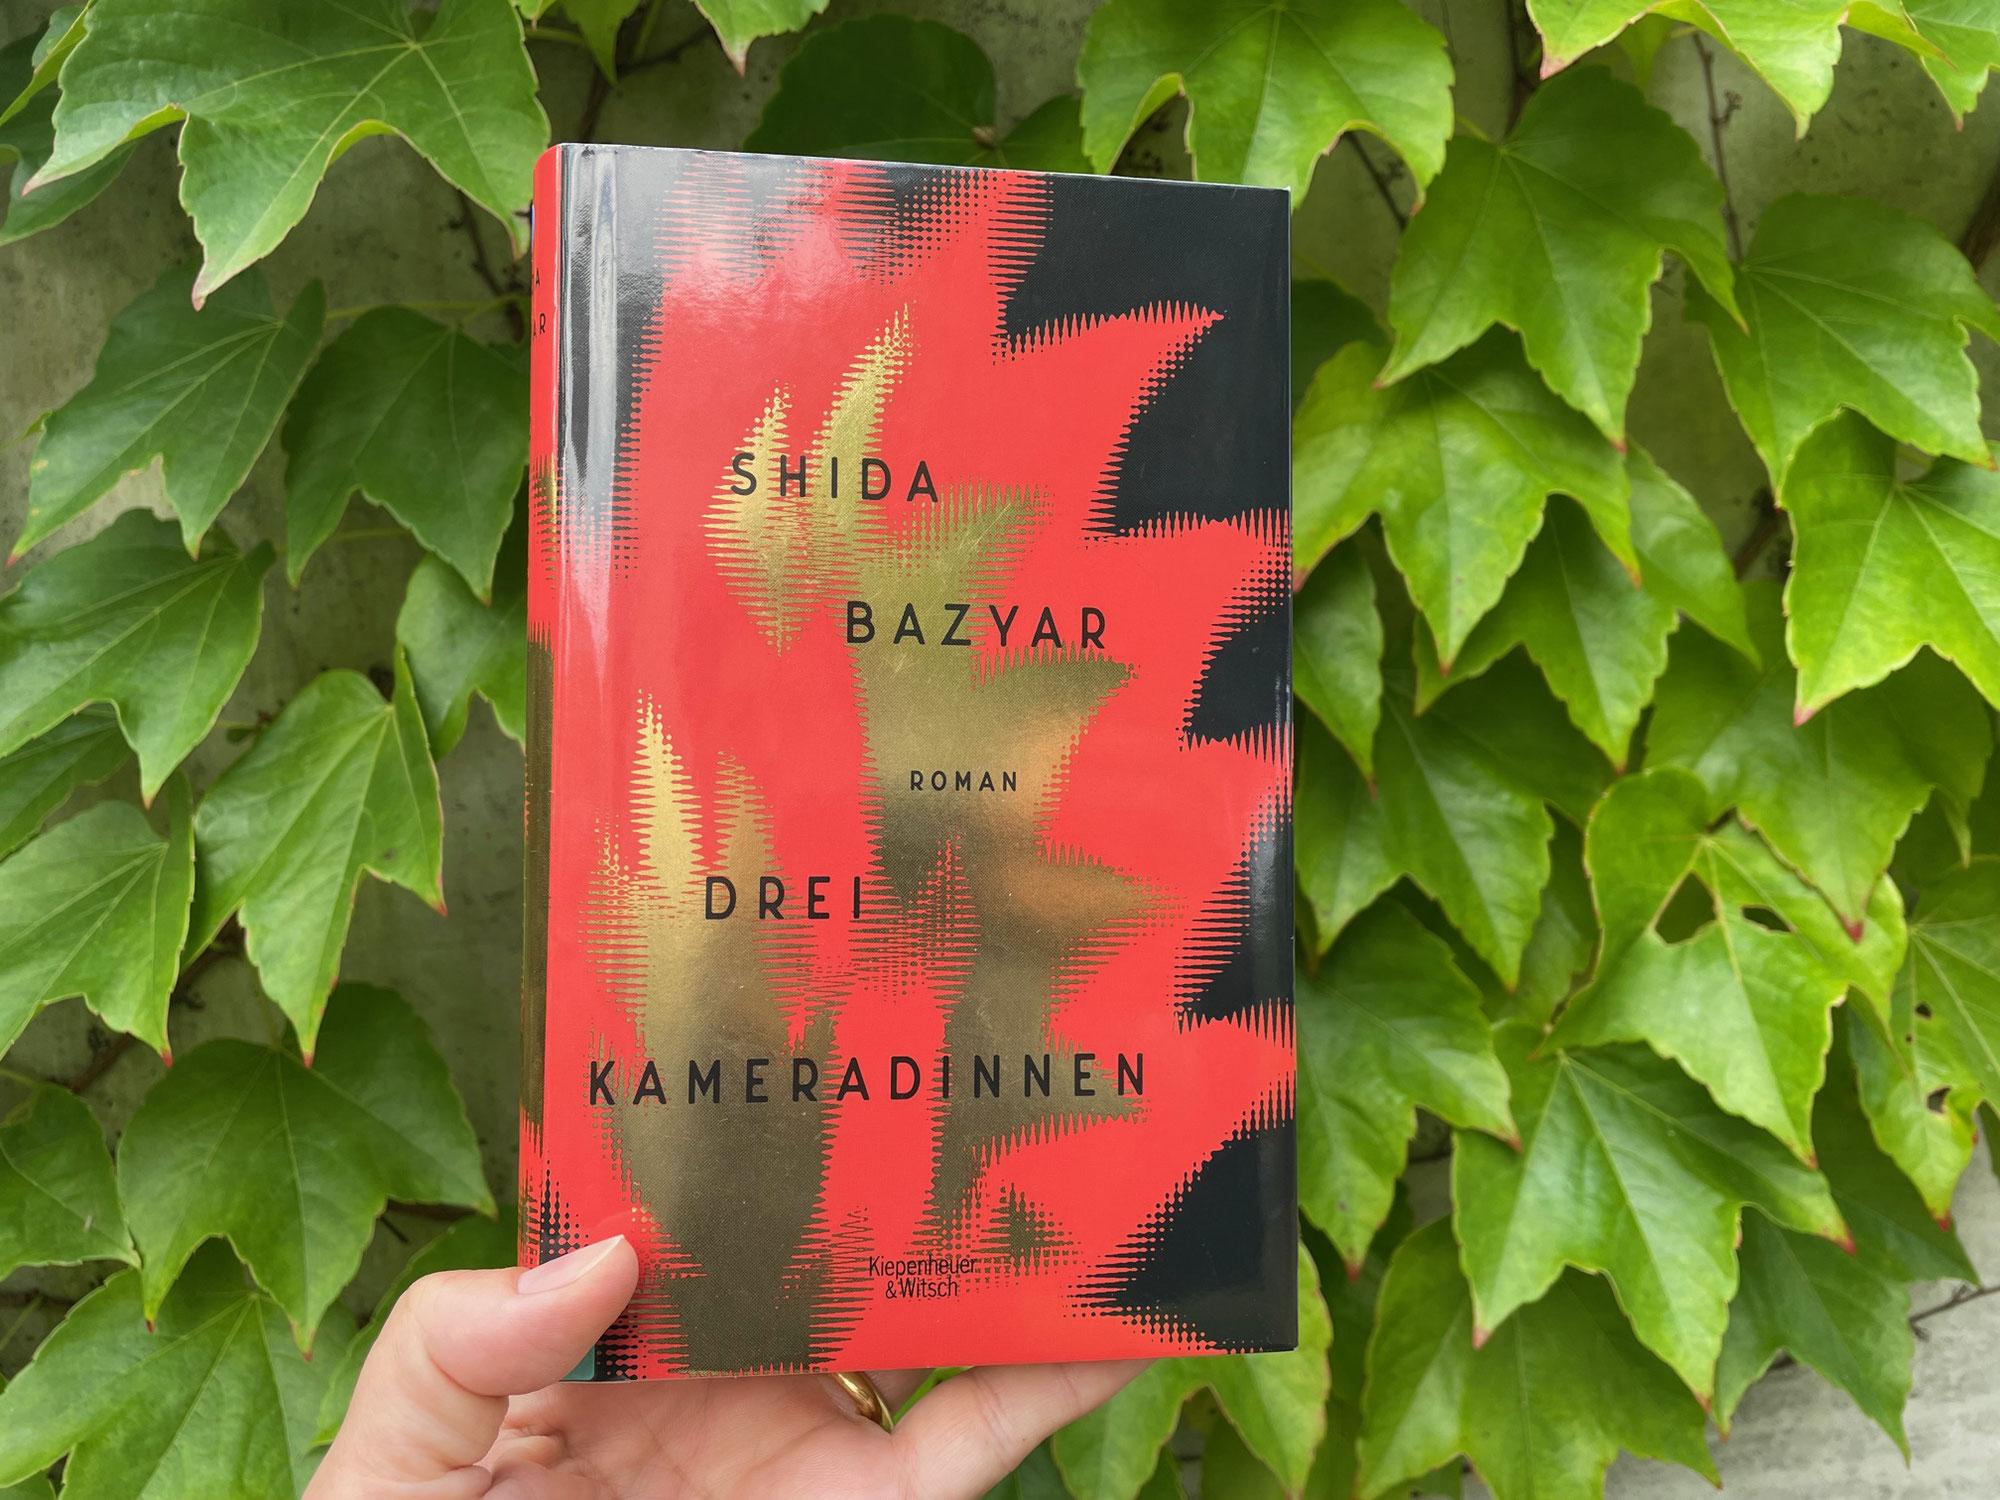 Shida Bazyar: Drei Kameradinnen (2021)